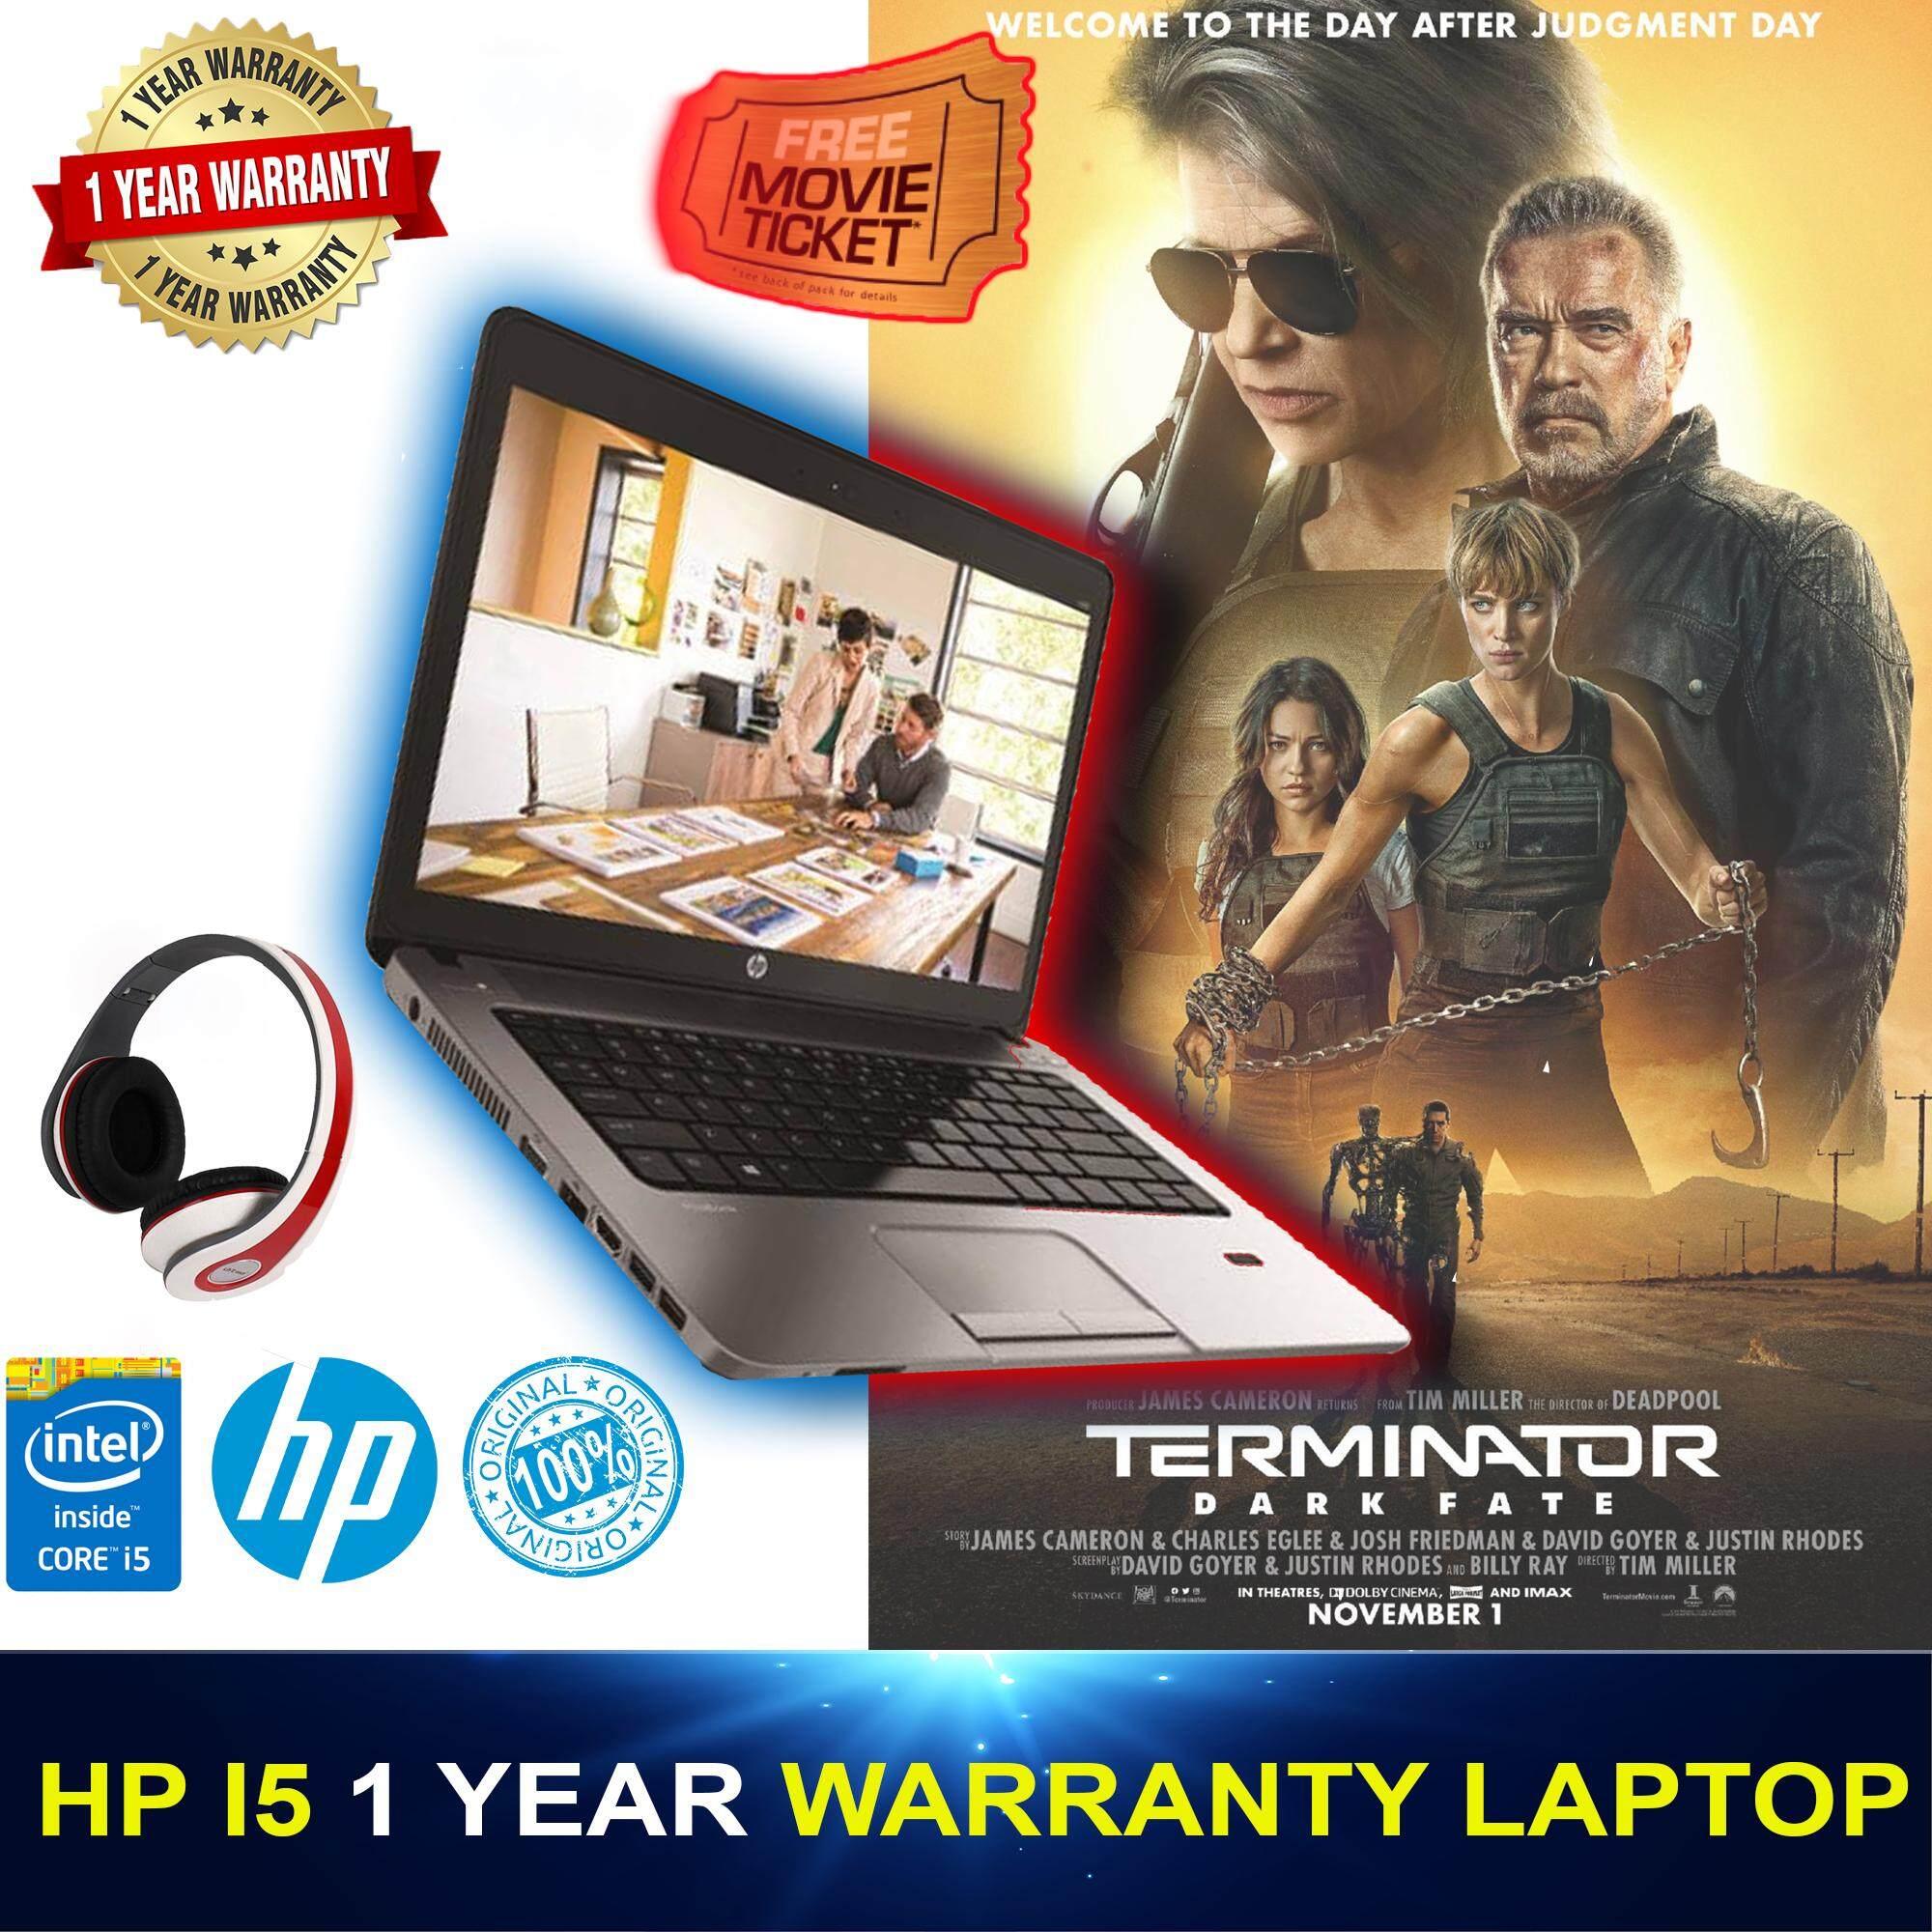 HP i5 4th Gen 1 Year Warranty Laptop - Free Headphone, Mouse, Bag, - 4GB RAM, 500GB HDD or 256 SSD , WebCam, Wifi, Bluetooth, Hp 100% Original Laptop refurbished (Launch Promotion) Malaysia